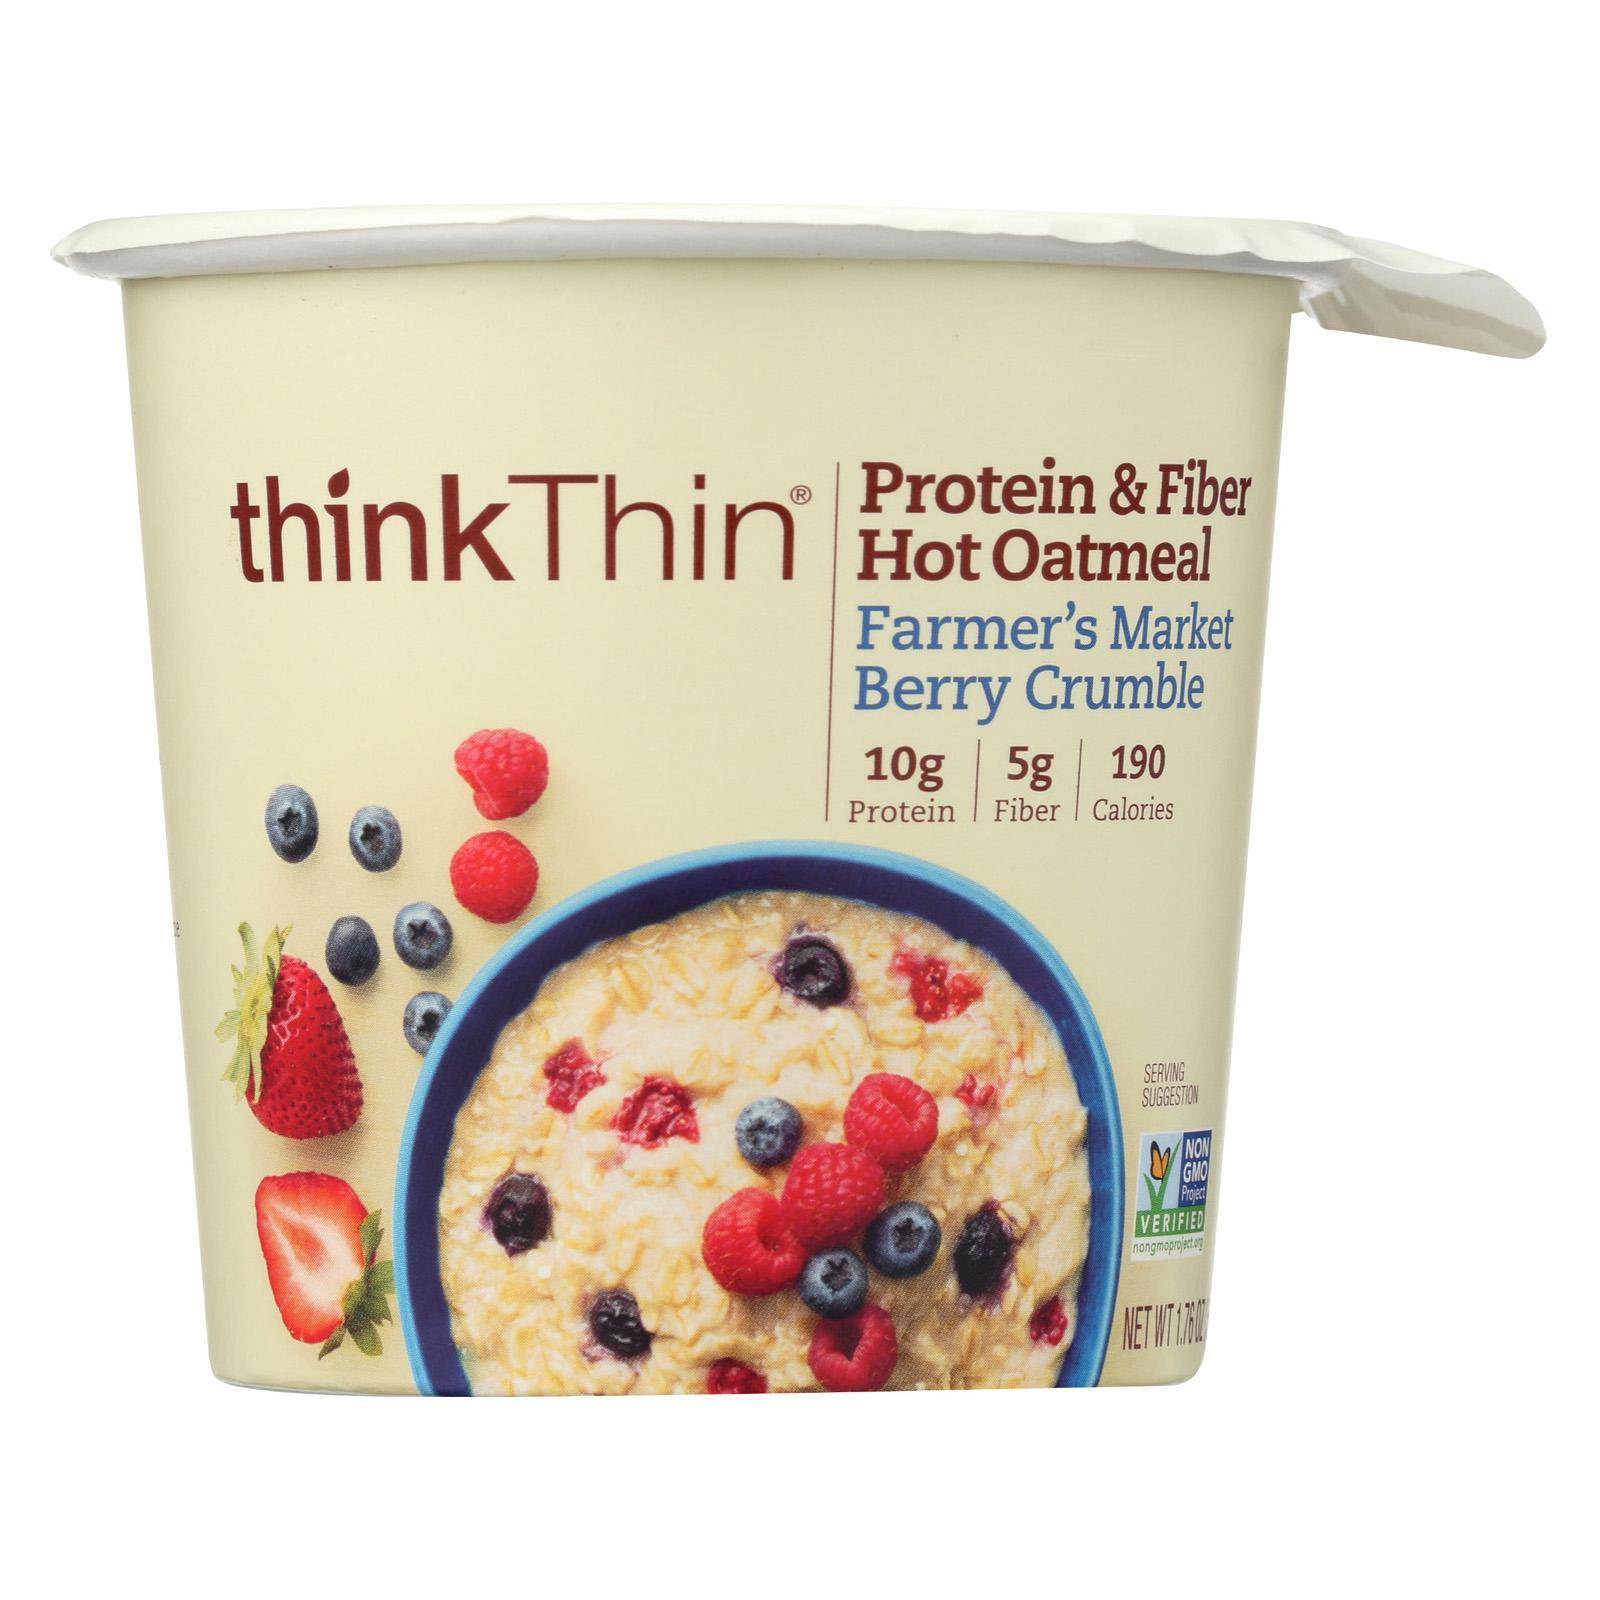 thinkThin Protein & Fiber Hot Oatmeal, Farmer's Market Berry Crumble, 1.76 oz Bow, 6 Count